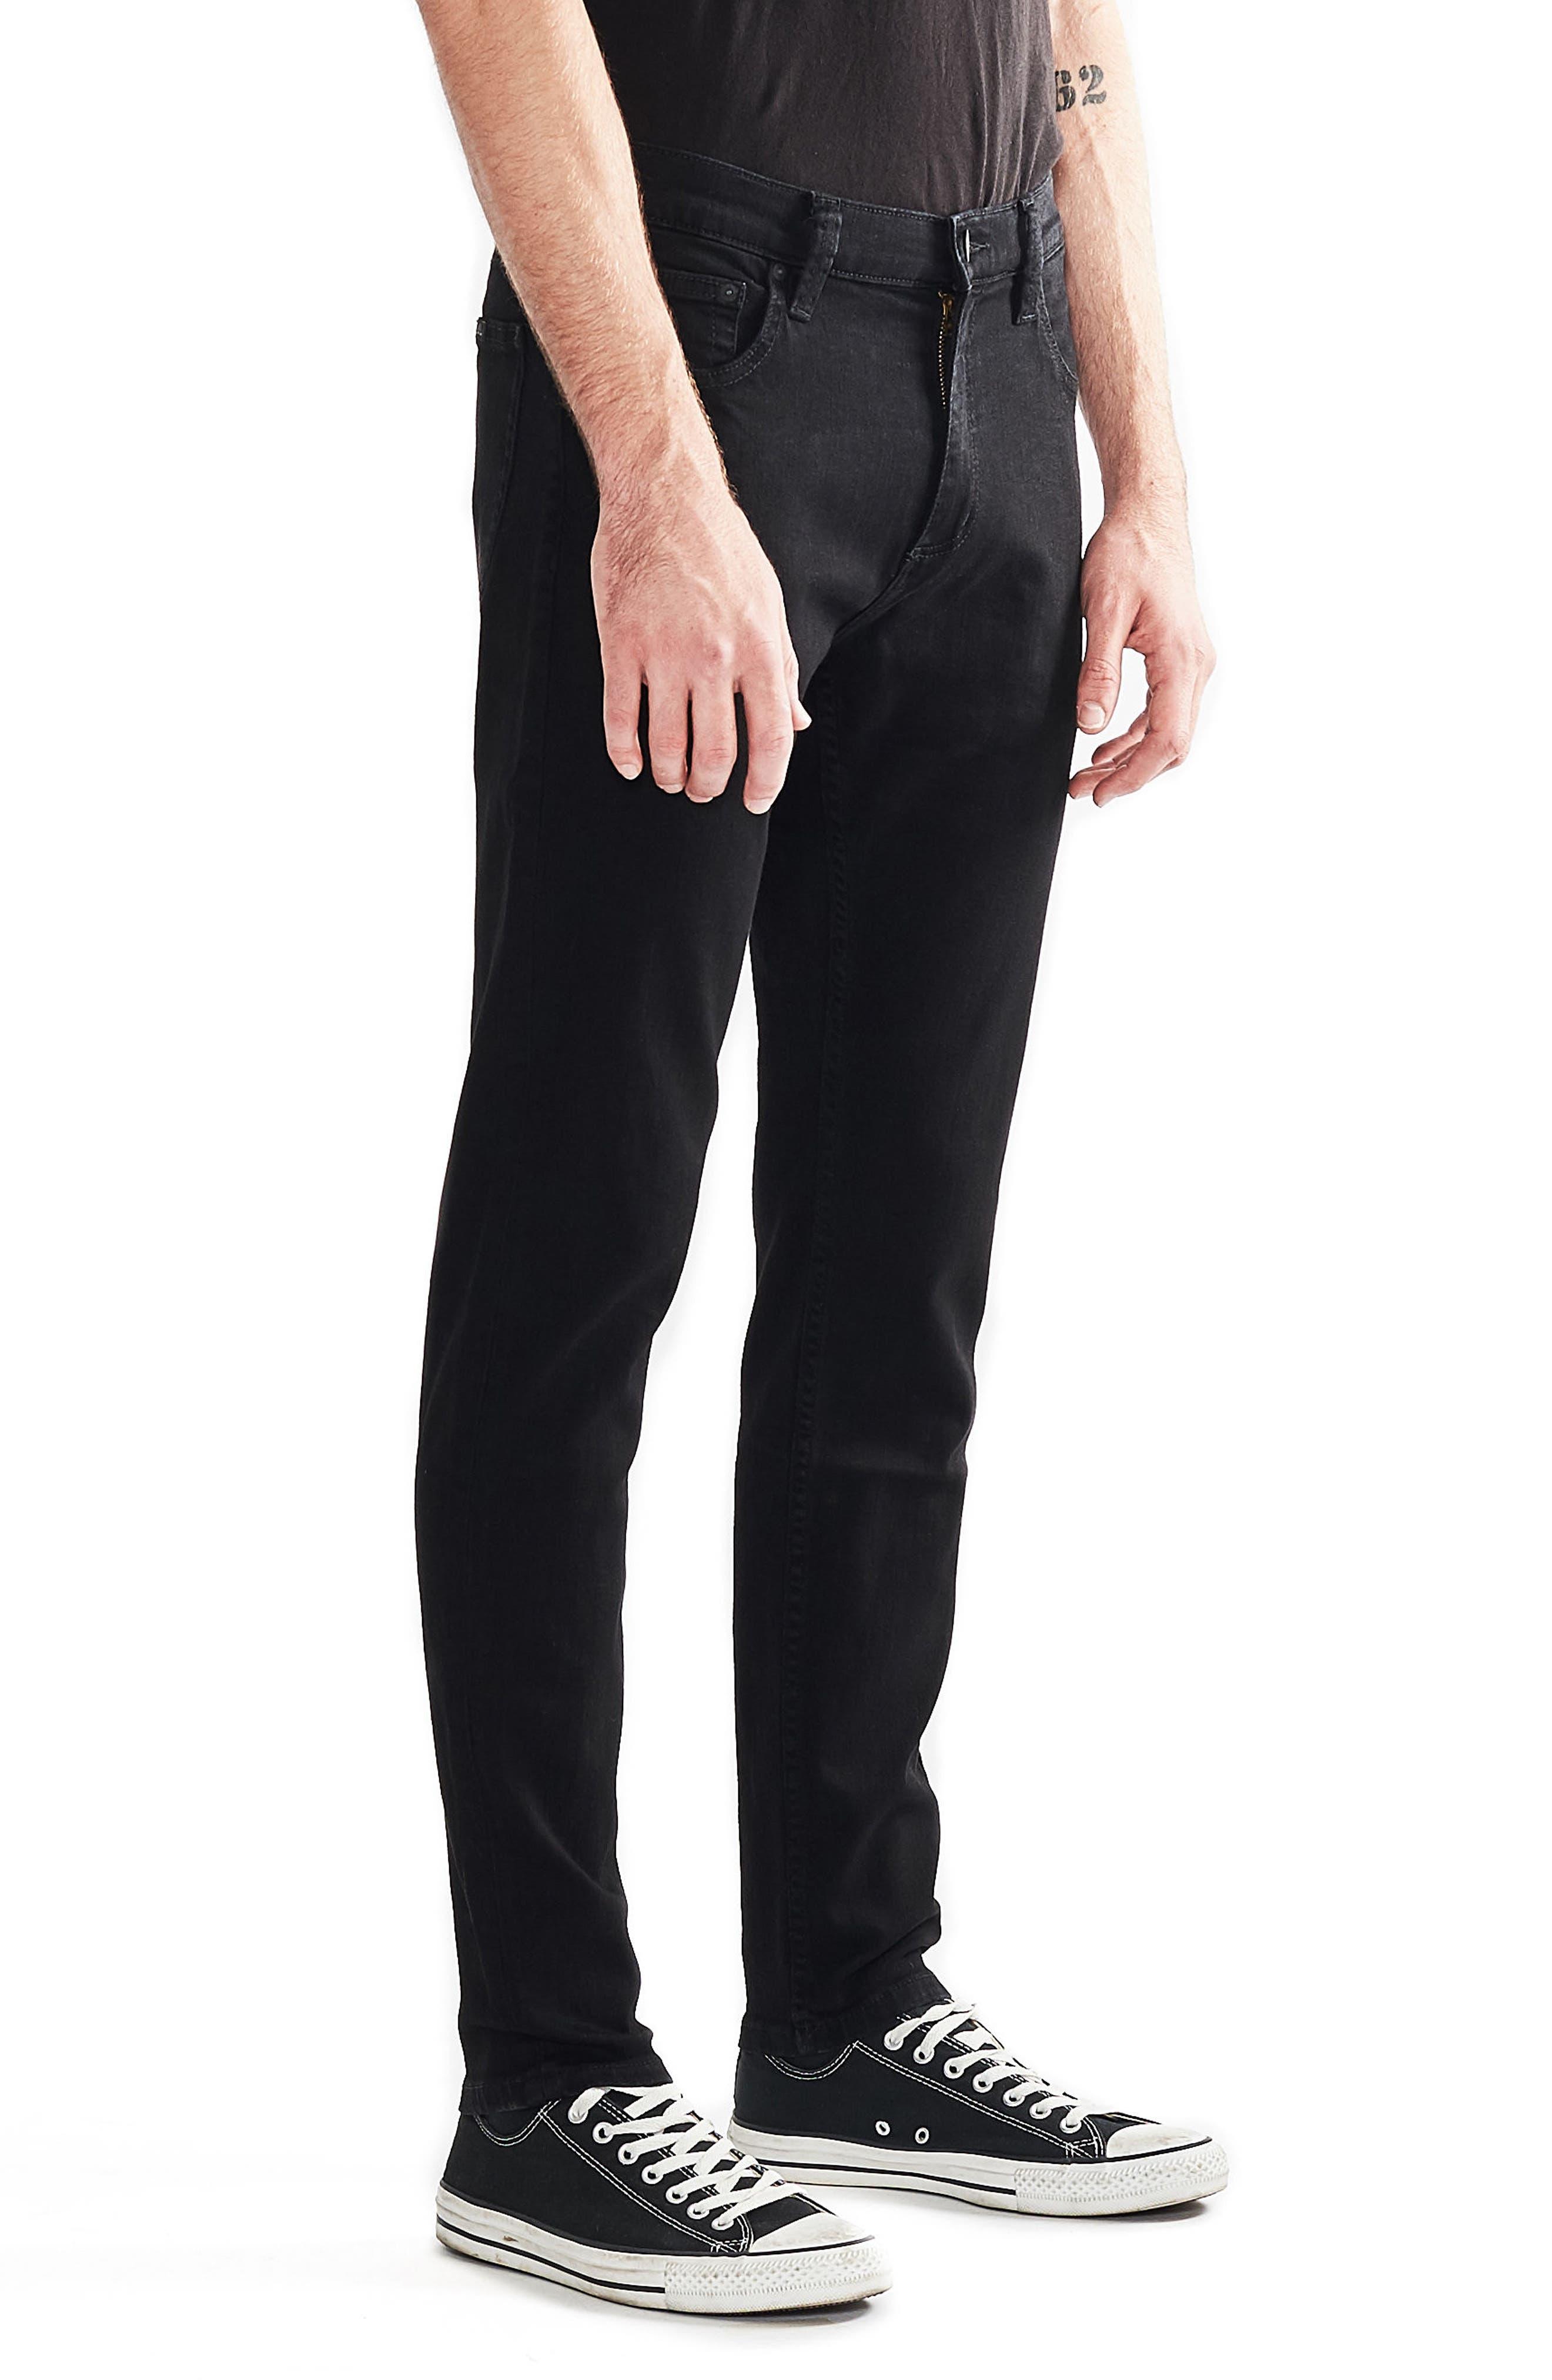 Stinger Skinny Fit Jeans,                             Alternate thumbnail 3, color,                             Black Gold